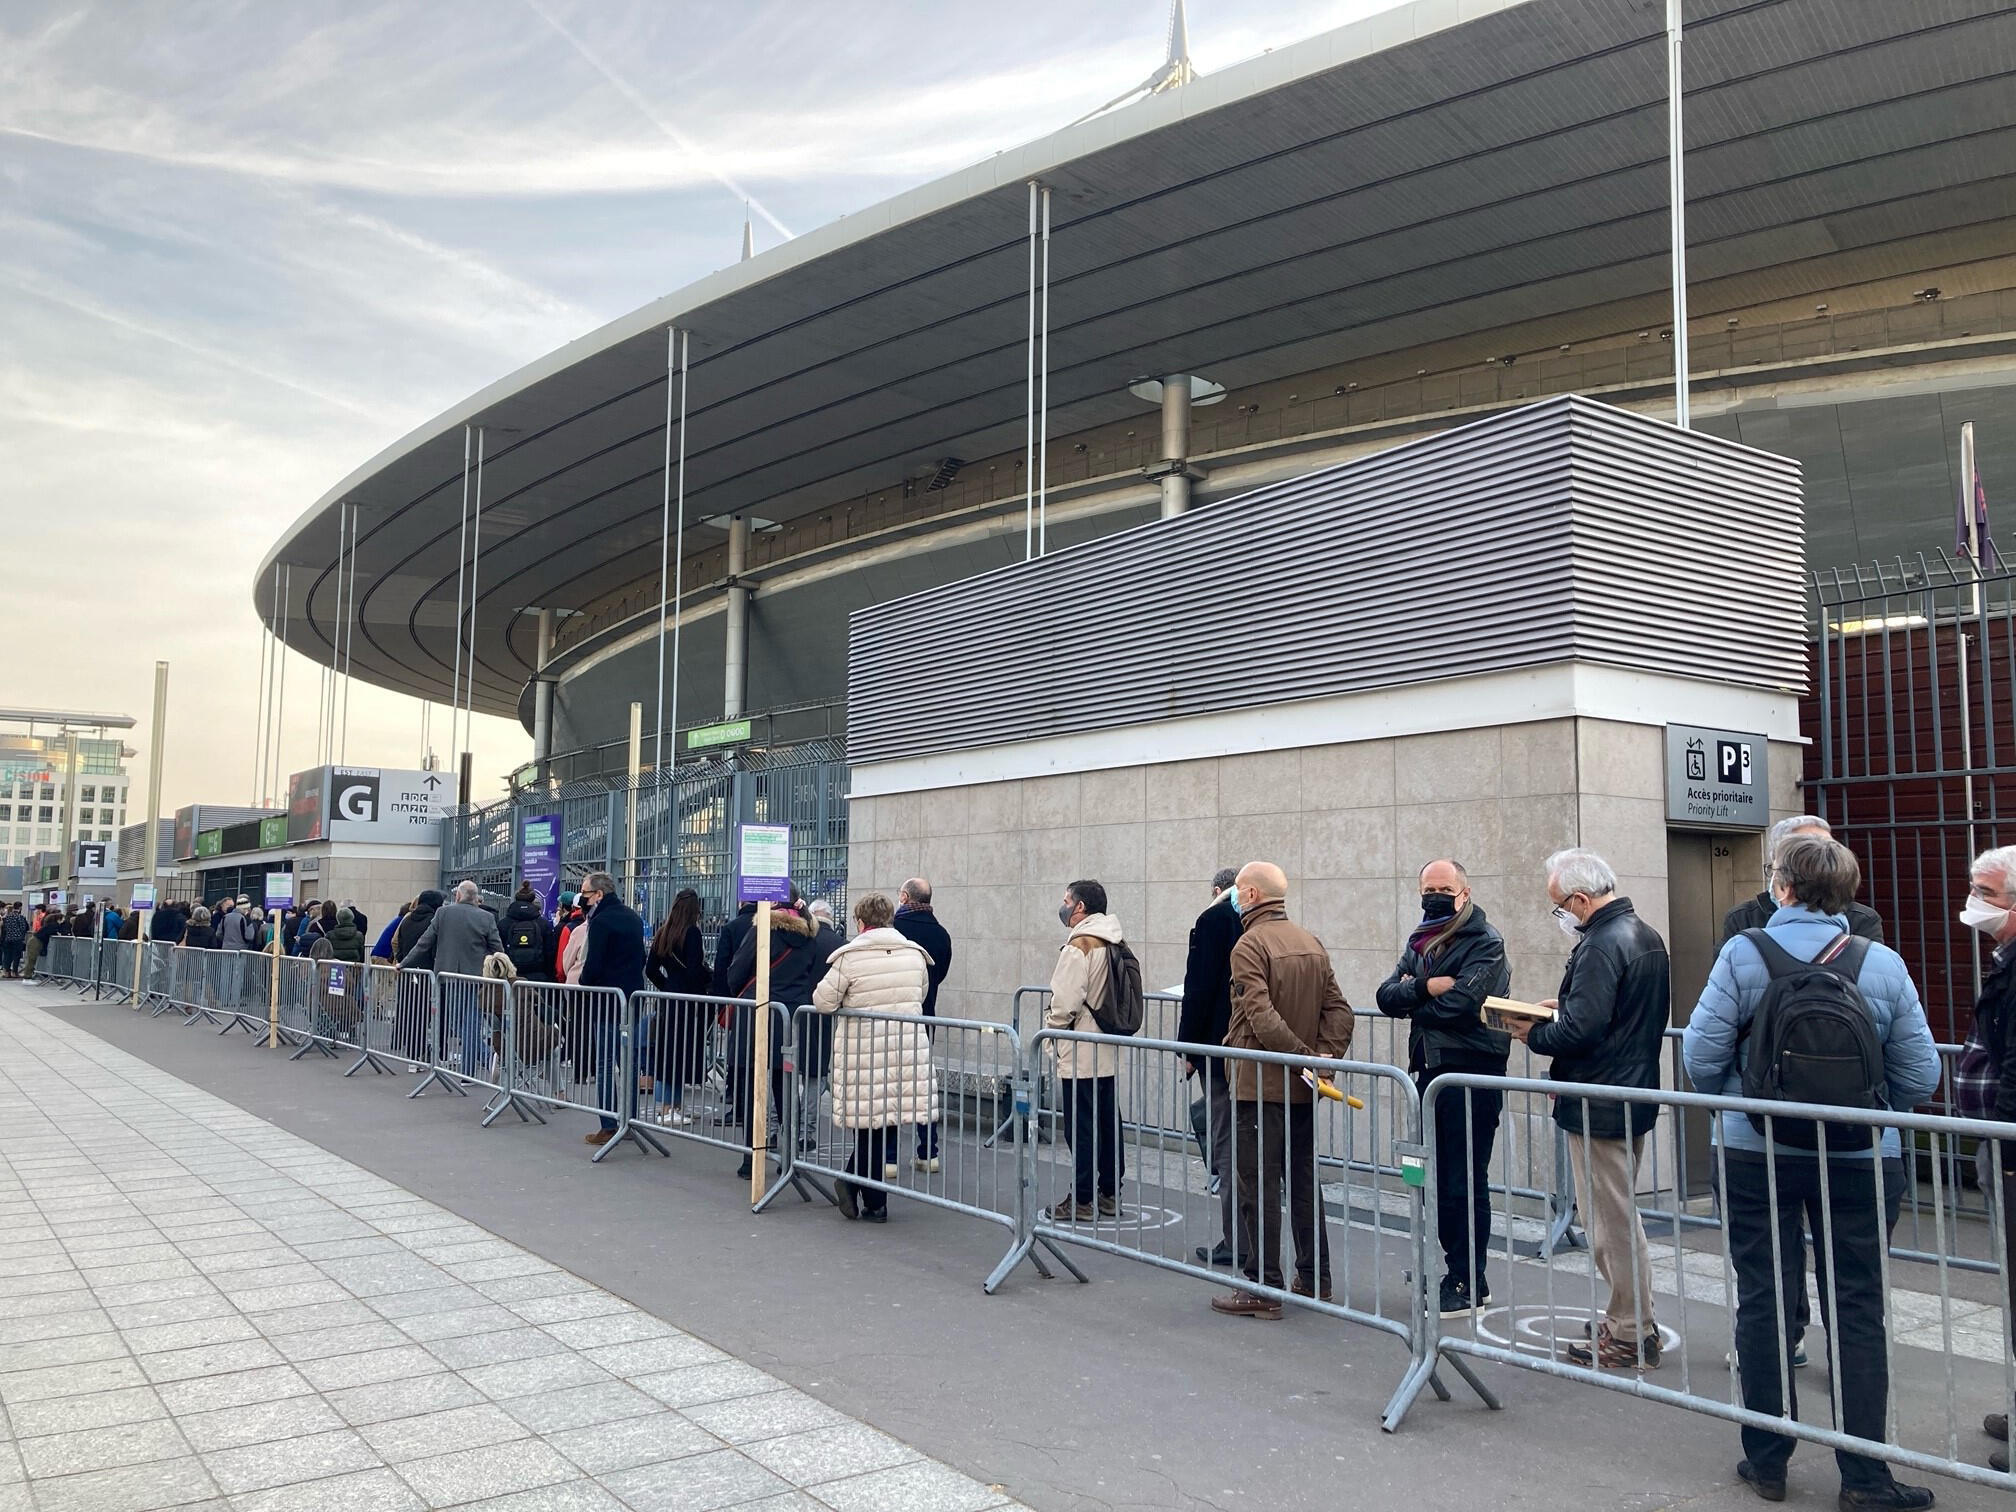 France - File attente vaccination - Stade de France